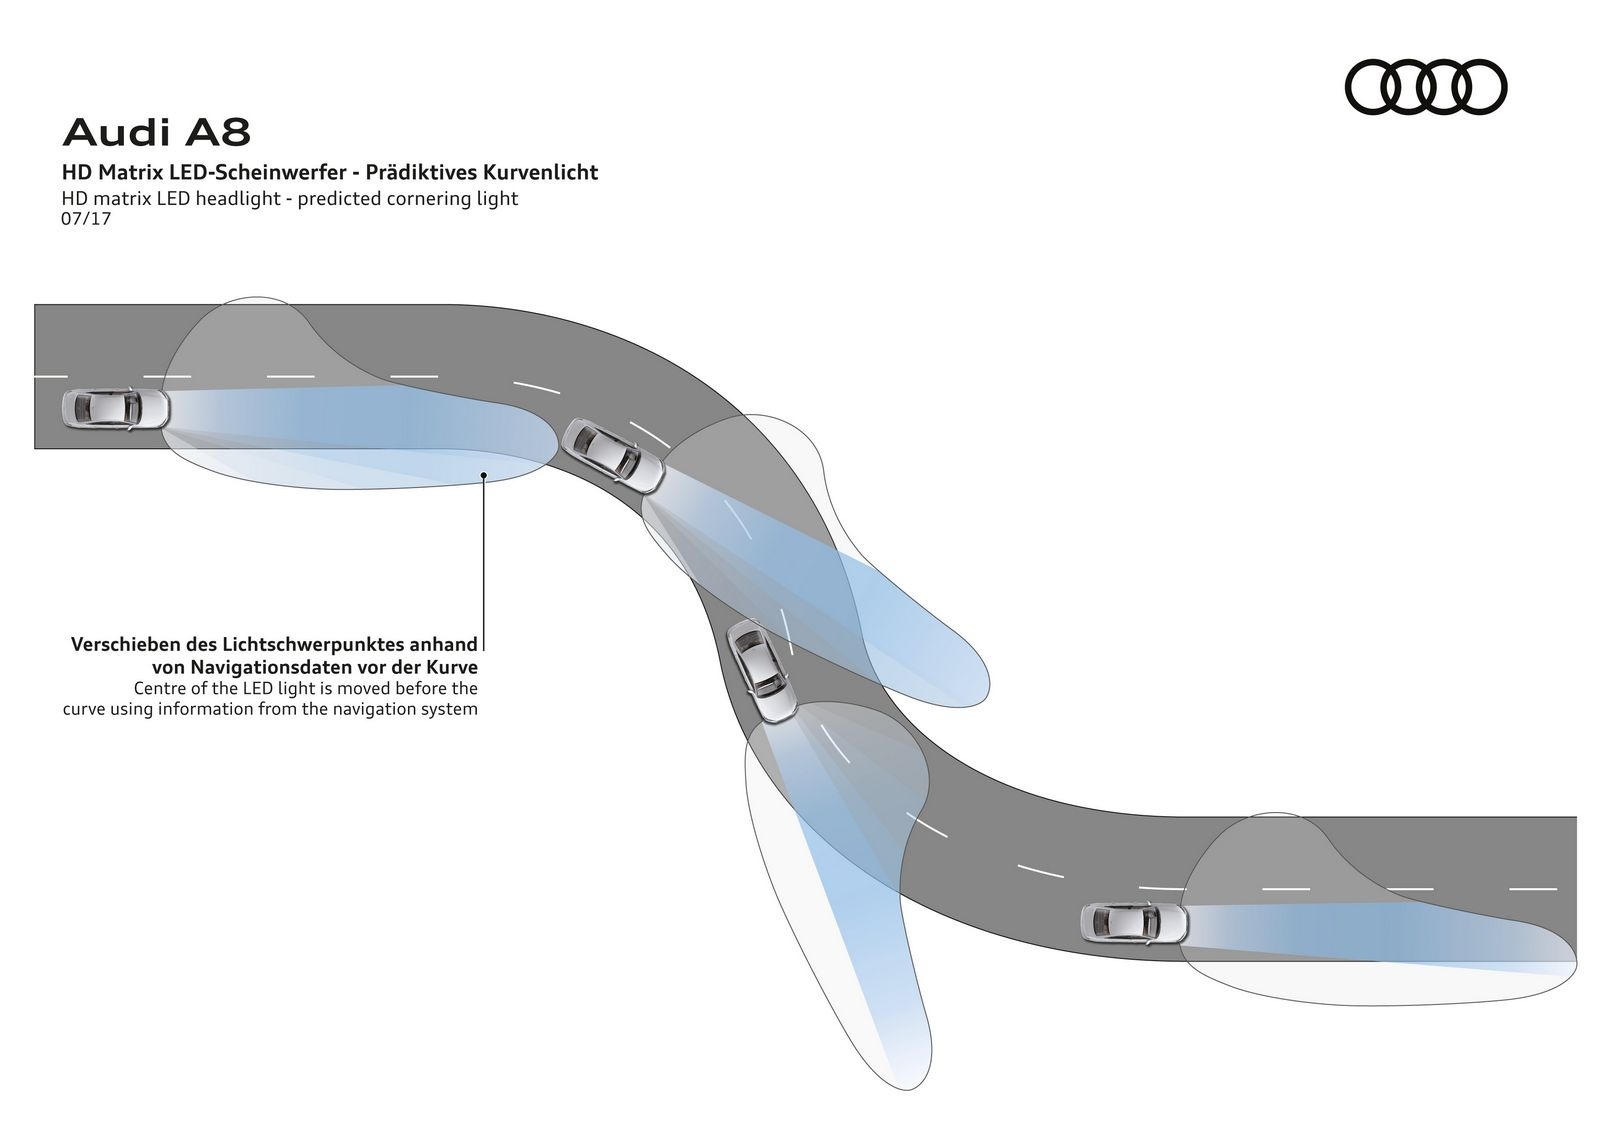 HD matrix LED headlight - predicted cornering light